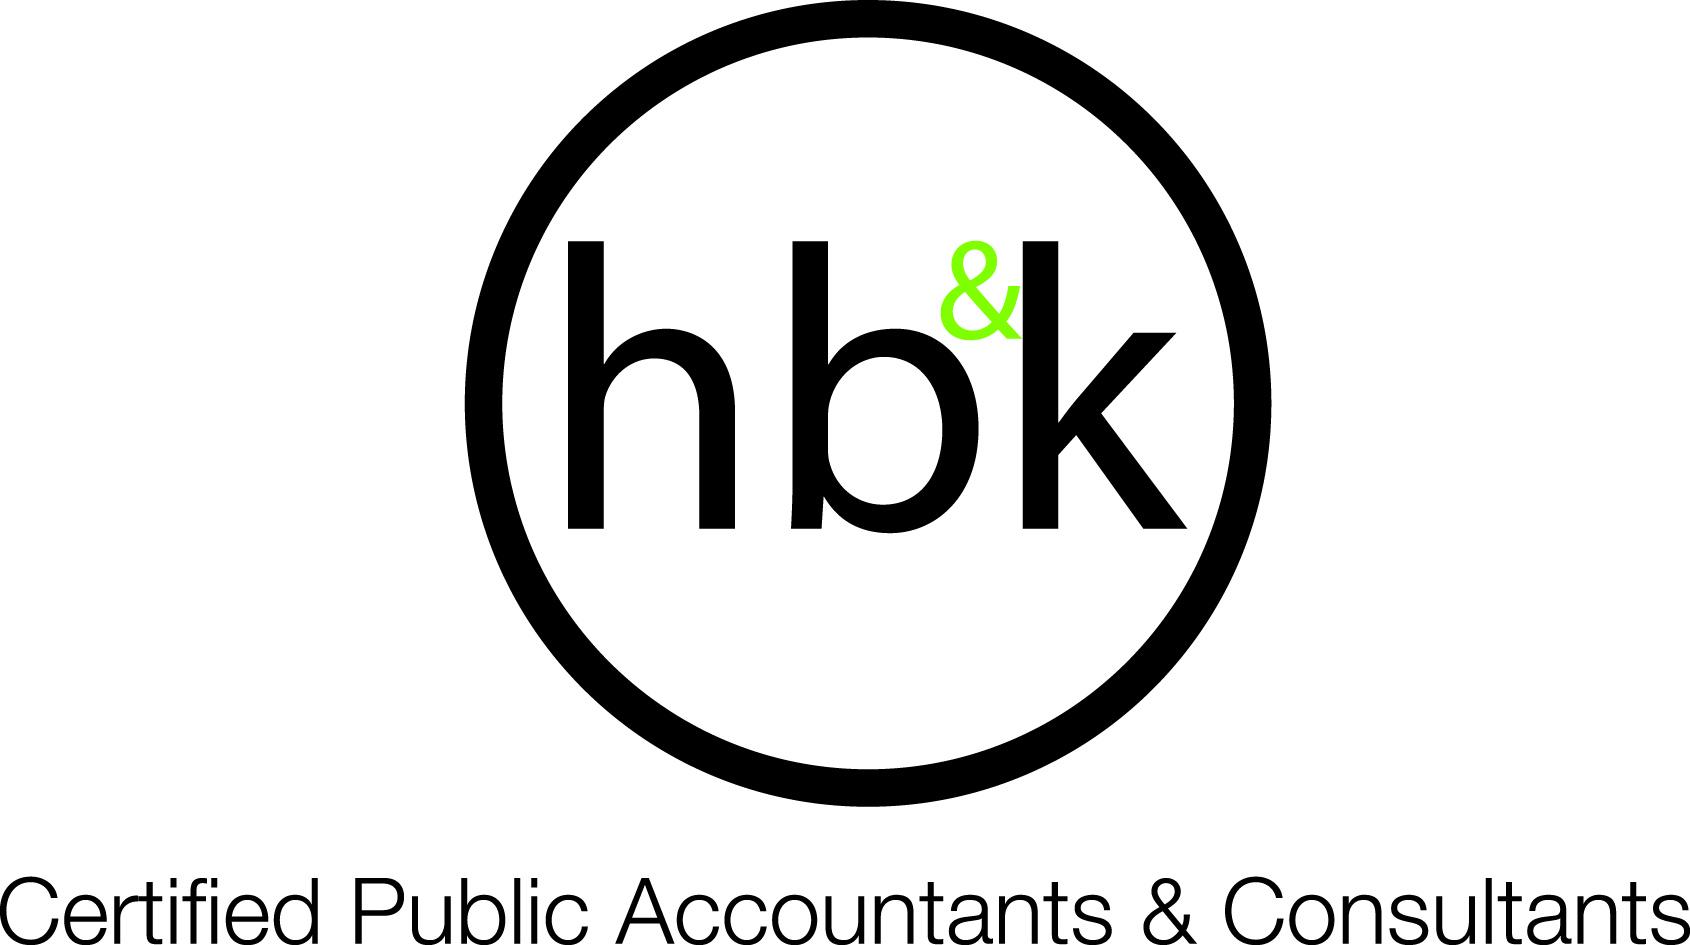 HBK-logo.jpg